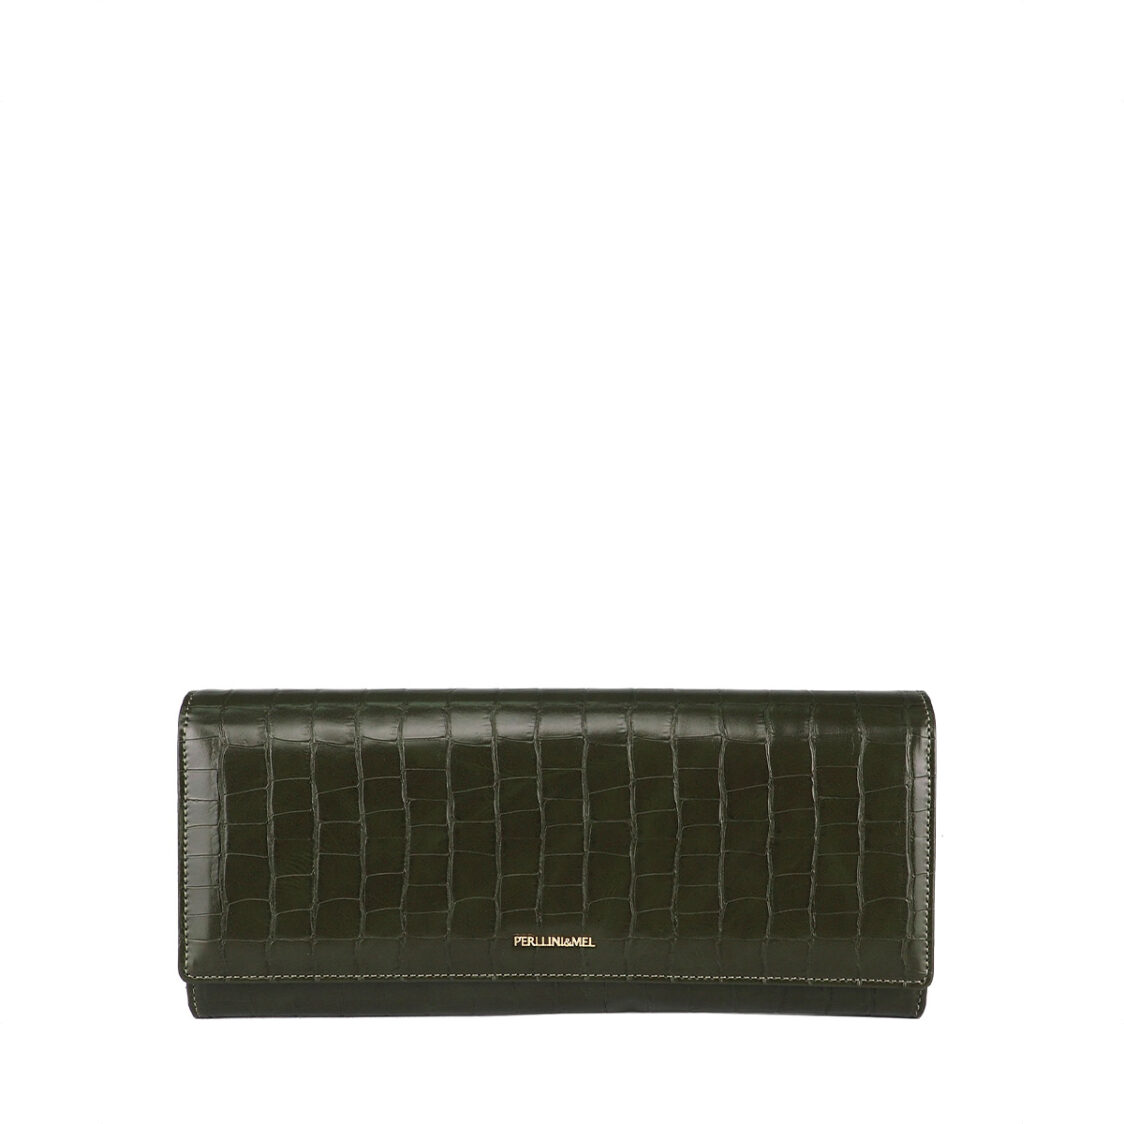 Perllini  Mel Croc Effect Chain Clutch Sling Bag Khaki PF3360C-Kaki